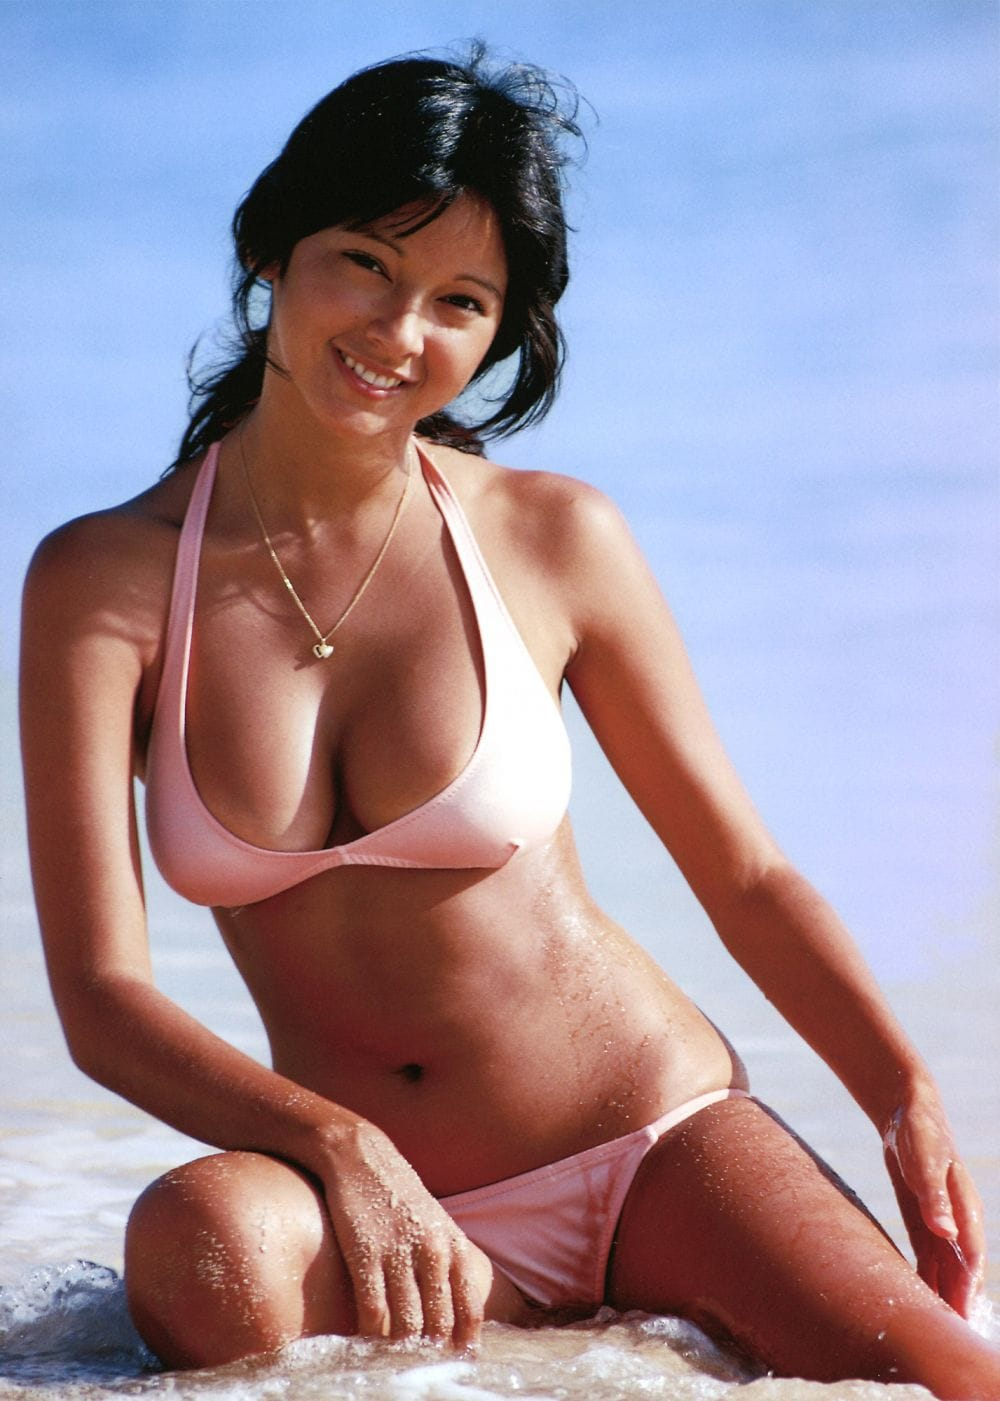 Jynine James (born 1972),Margarita Cordova Sex image Karen Sillas,Dawson Dunbar